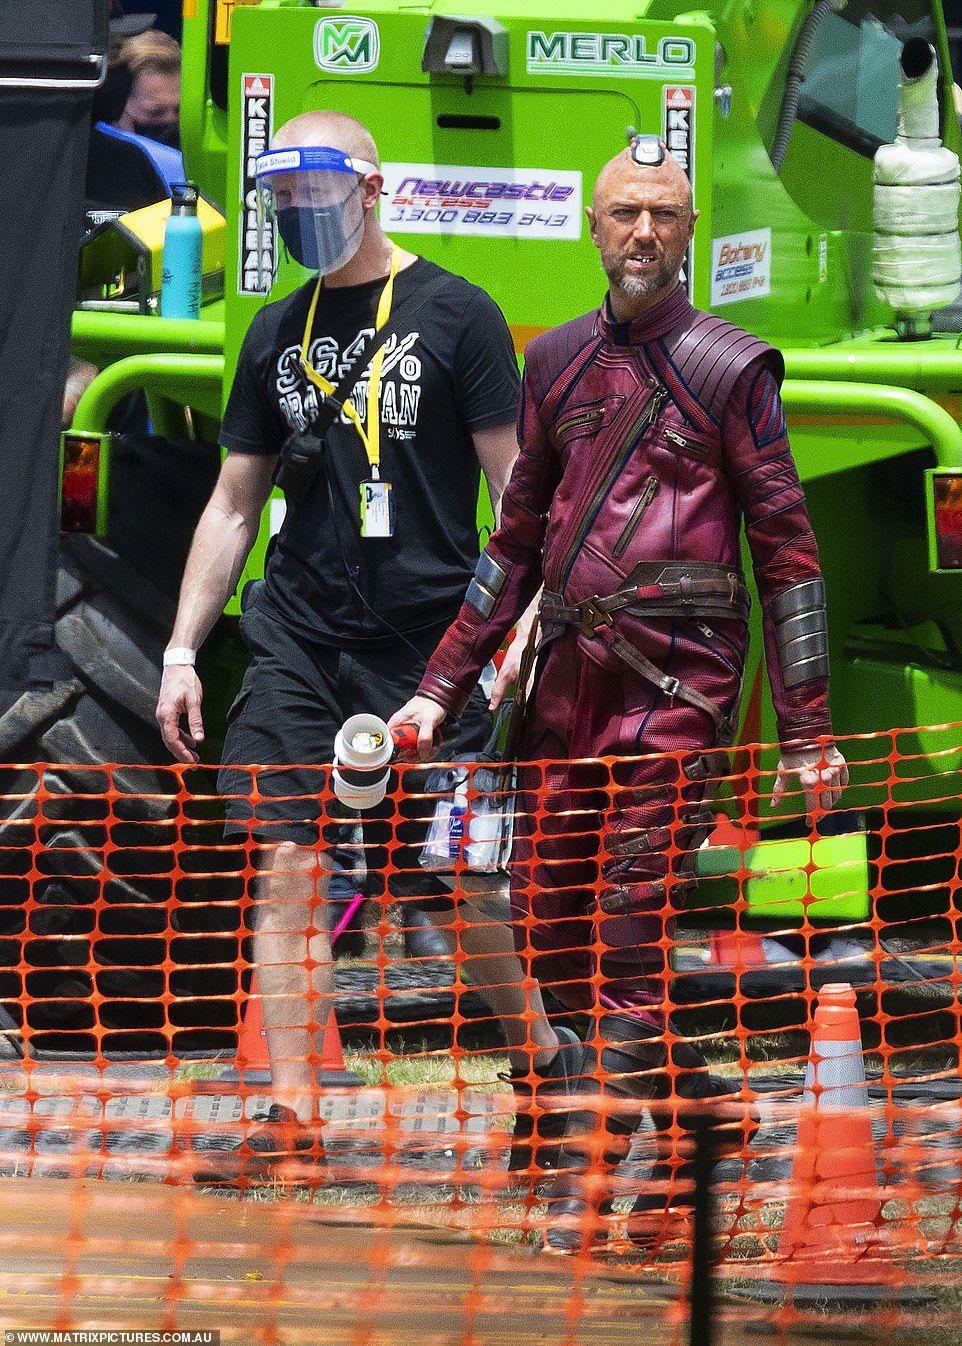 38720236-9209501-Scene_Sean_Gunn_was_seen_in_full_costume_on_set_of_the_film_donn-a-69_1612180155479